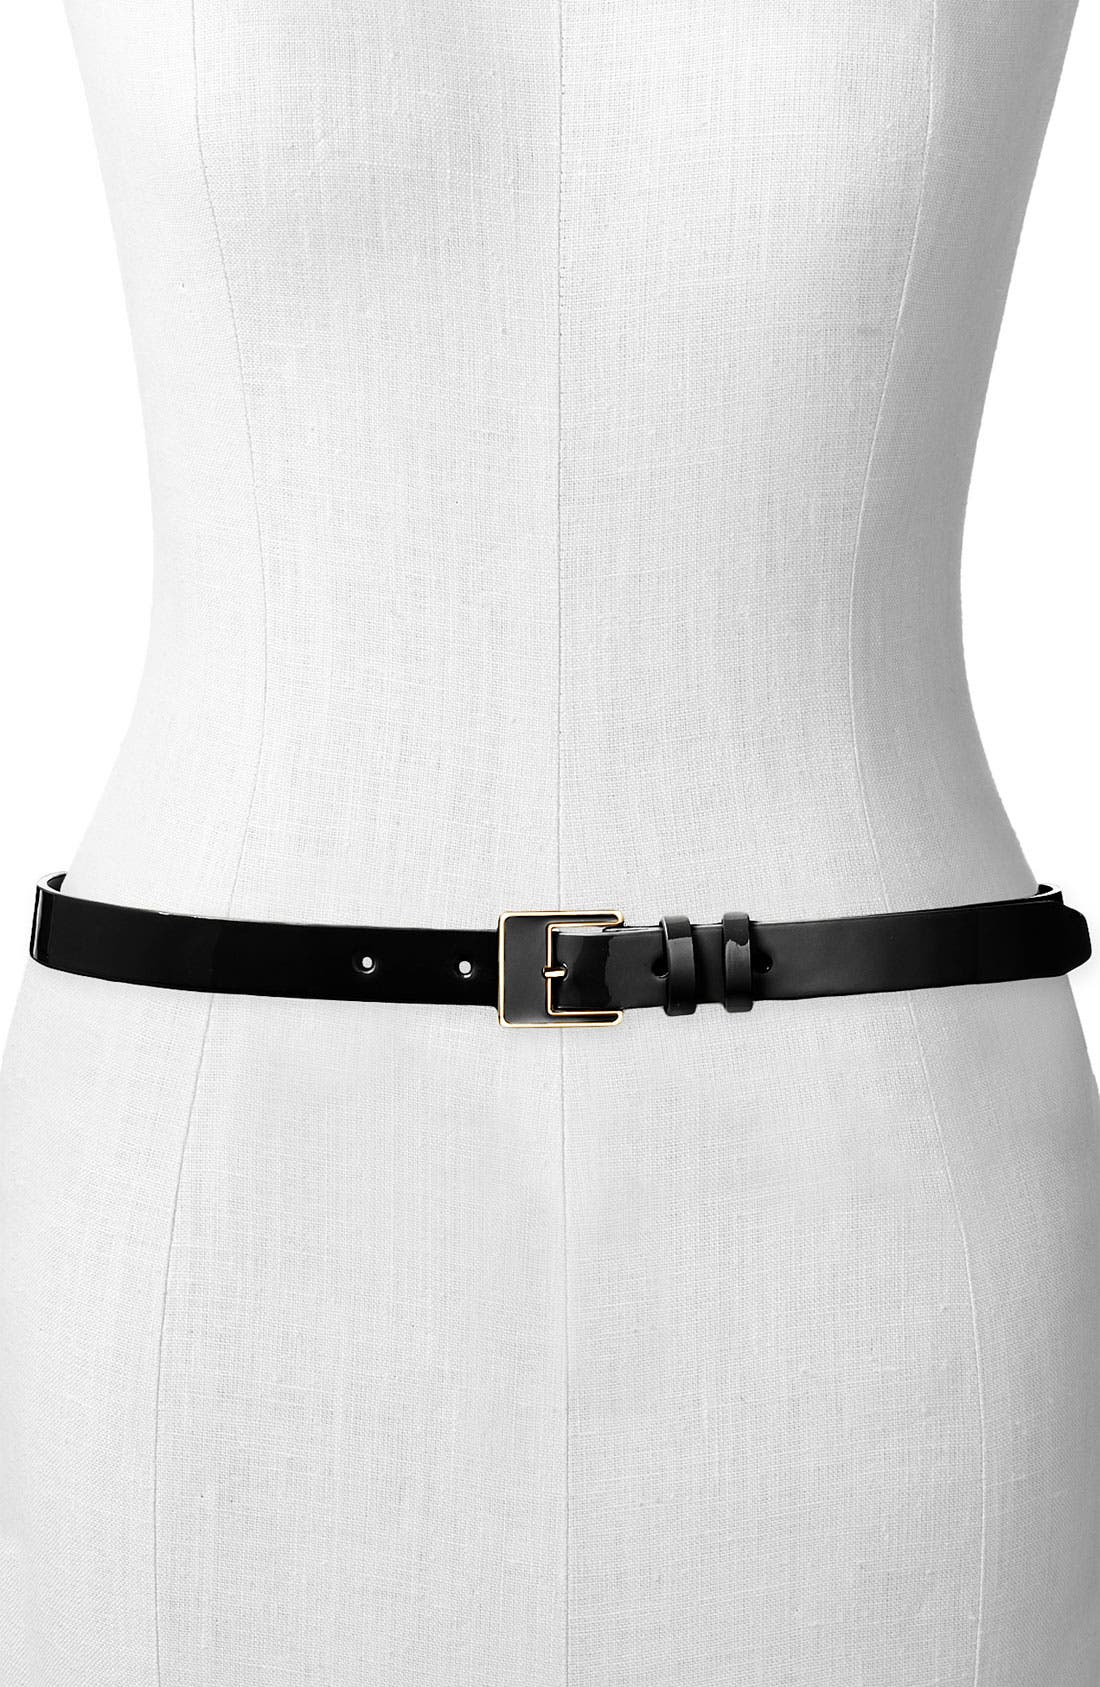 Patent Leather Belt, Main, color, 001